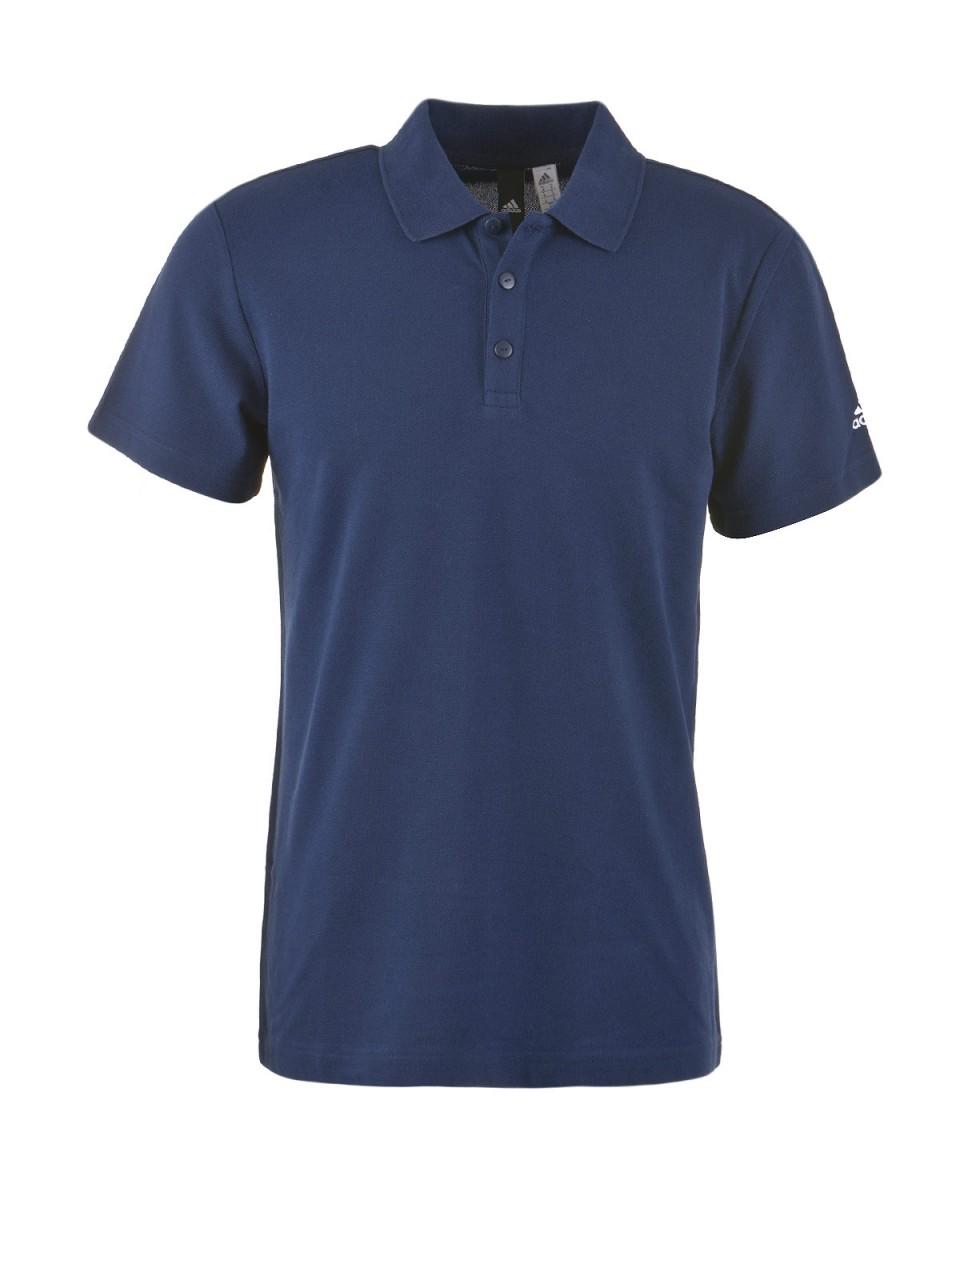 ADIDAS Poloshirt, navy